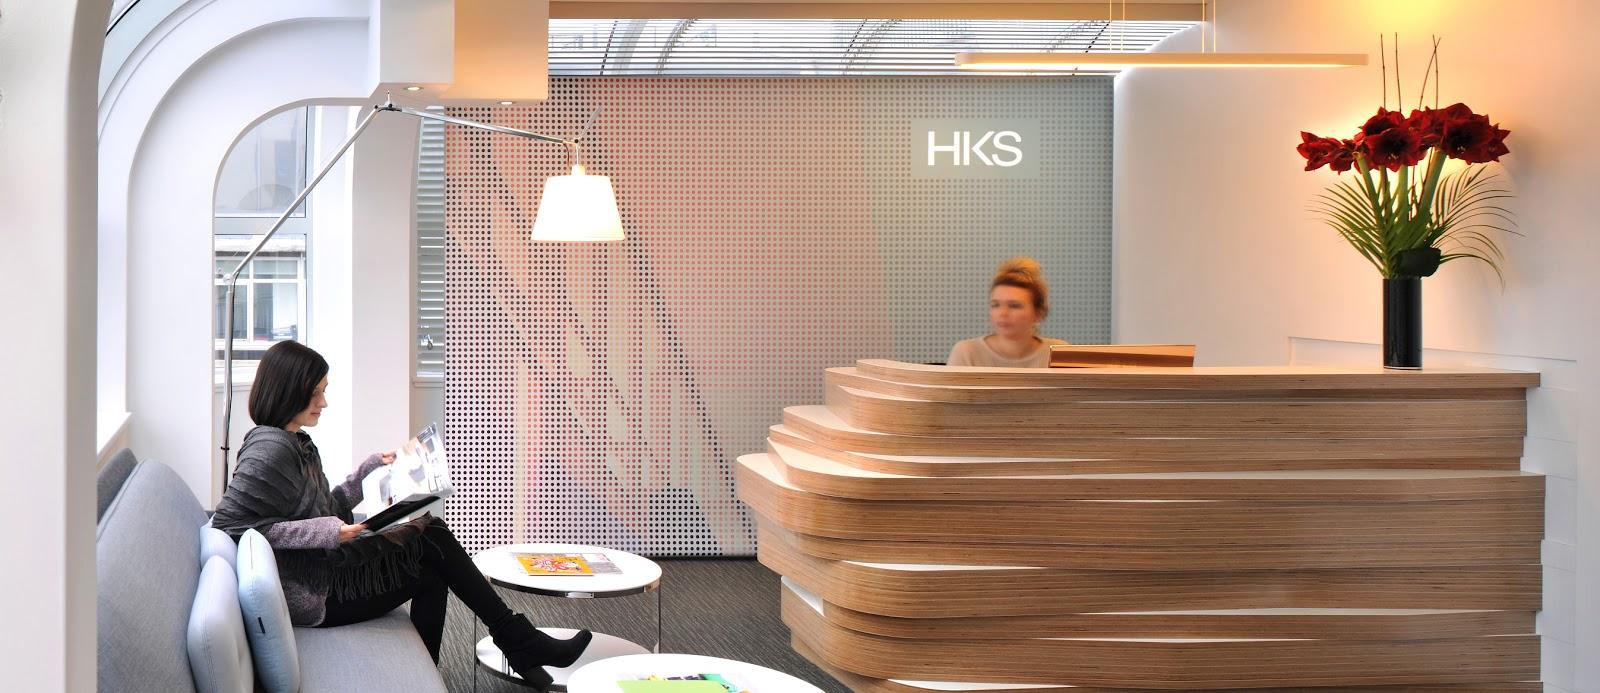 office backdrop. New Soho Office For HKS Architects Backdrop